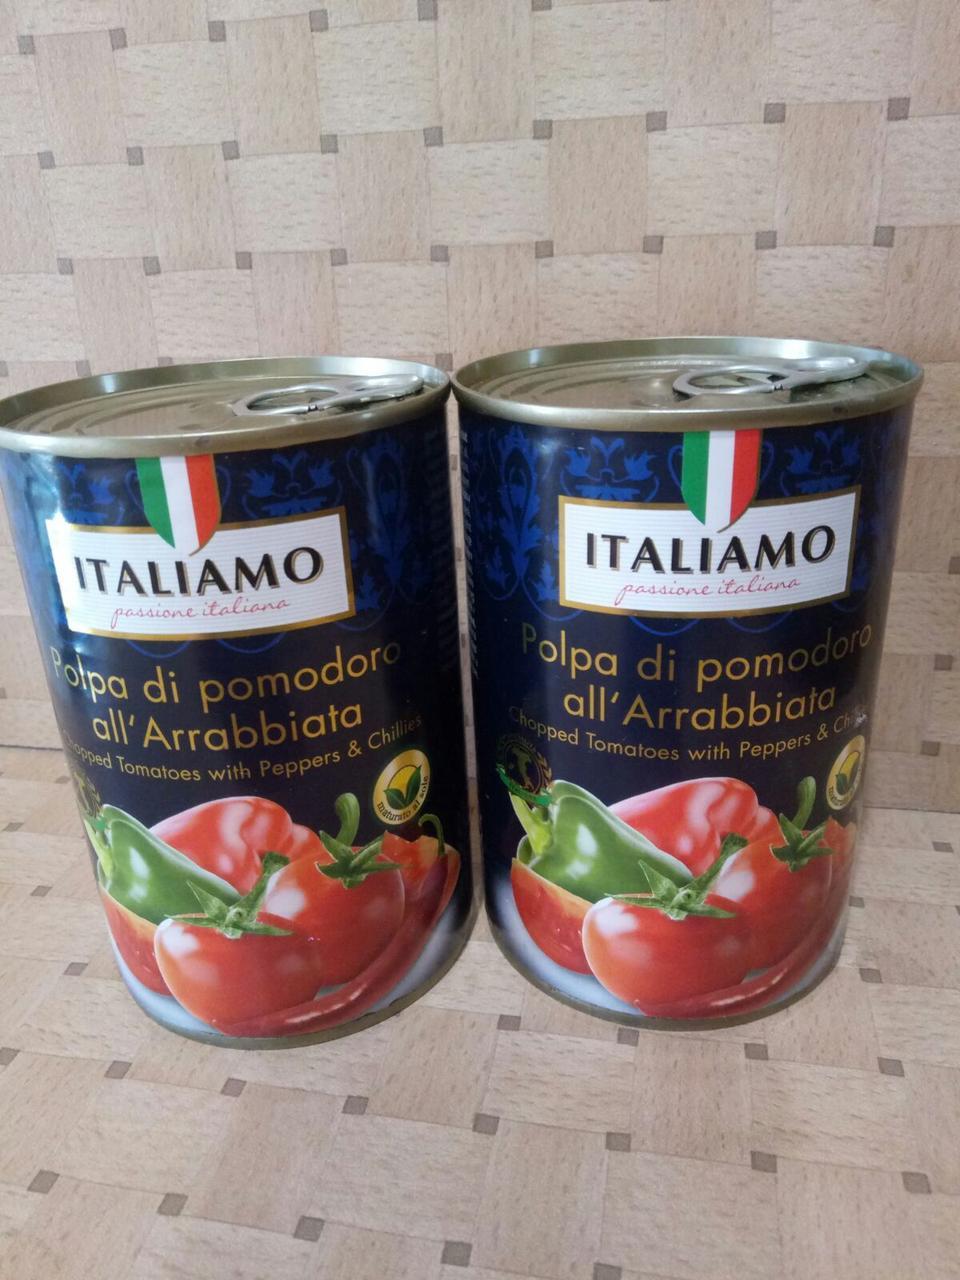 Томаты в соусе Арабиата Italiamo, 400 г (Италия)